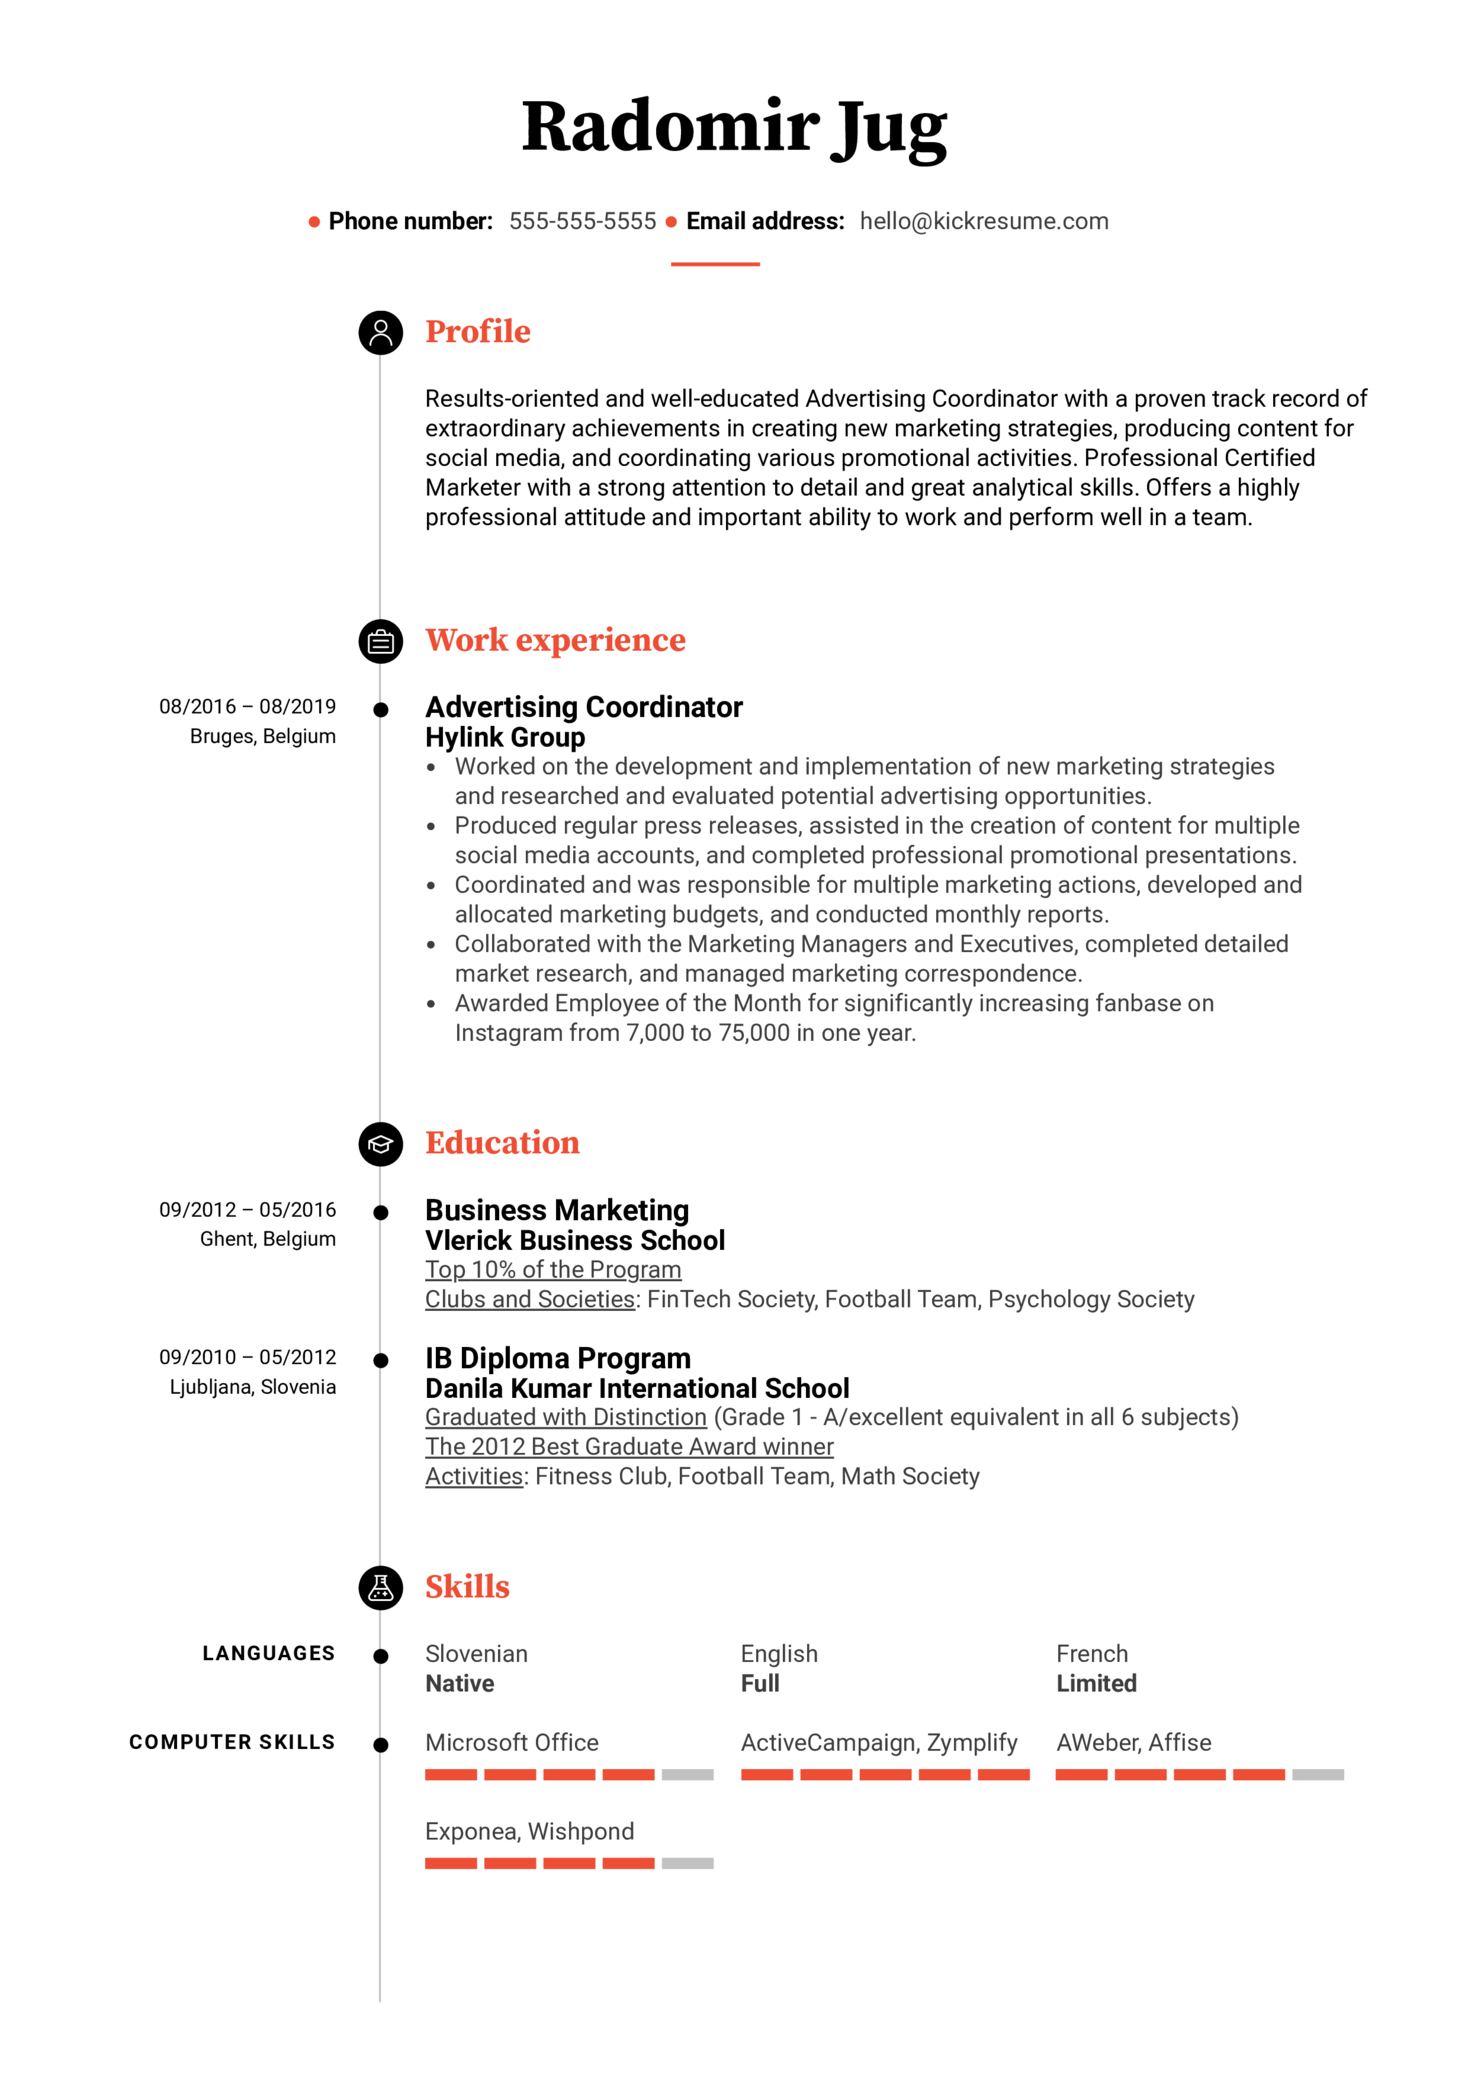 Advertising Coordinator Resume Example (Parte 1)